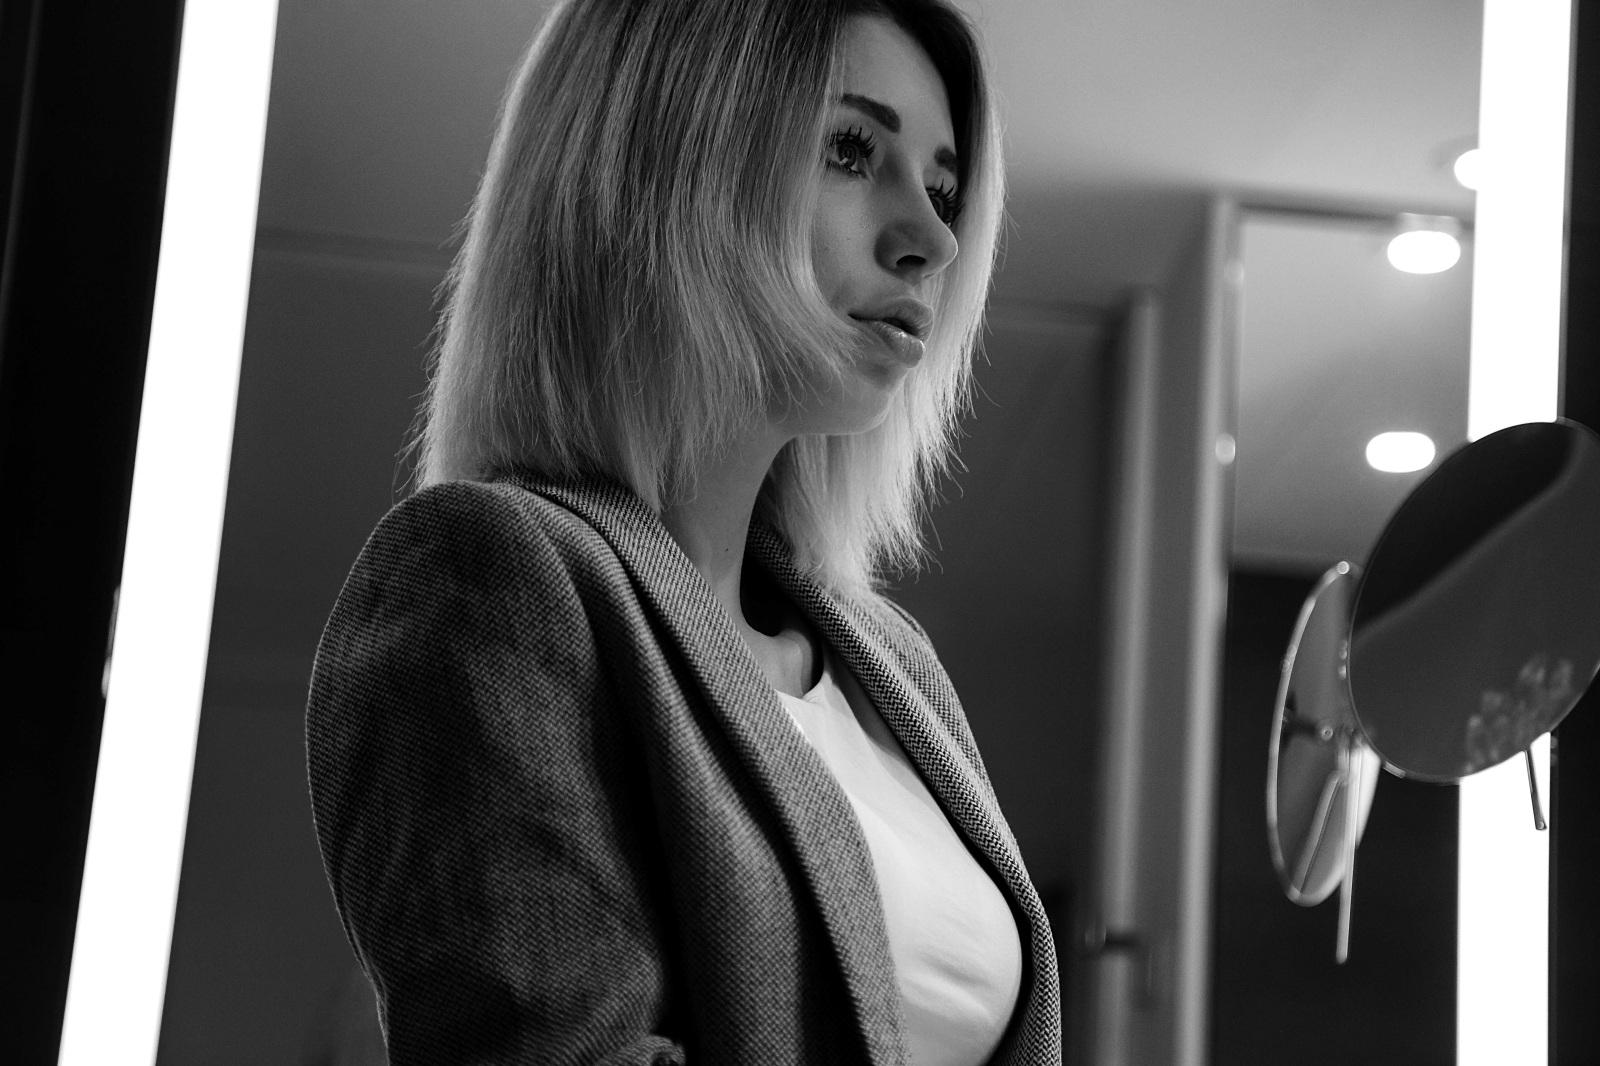 haare-tipps-beauty-blogger-germany-newsha-haircare-6